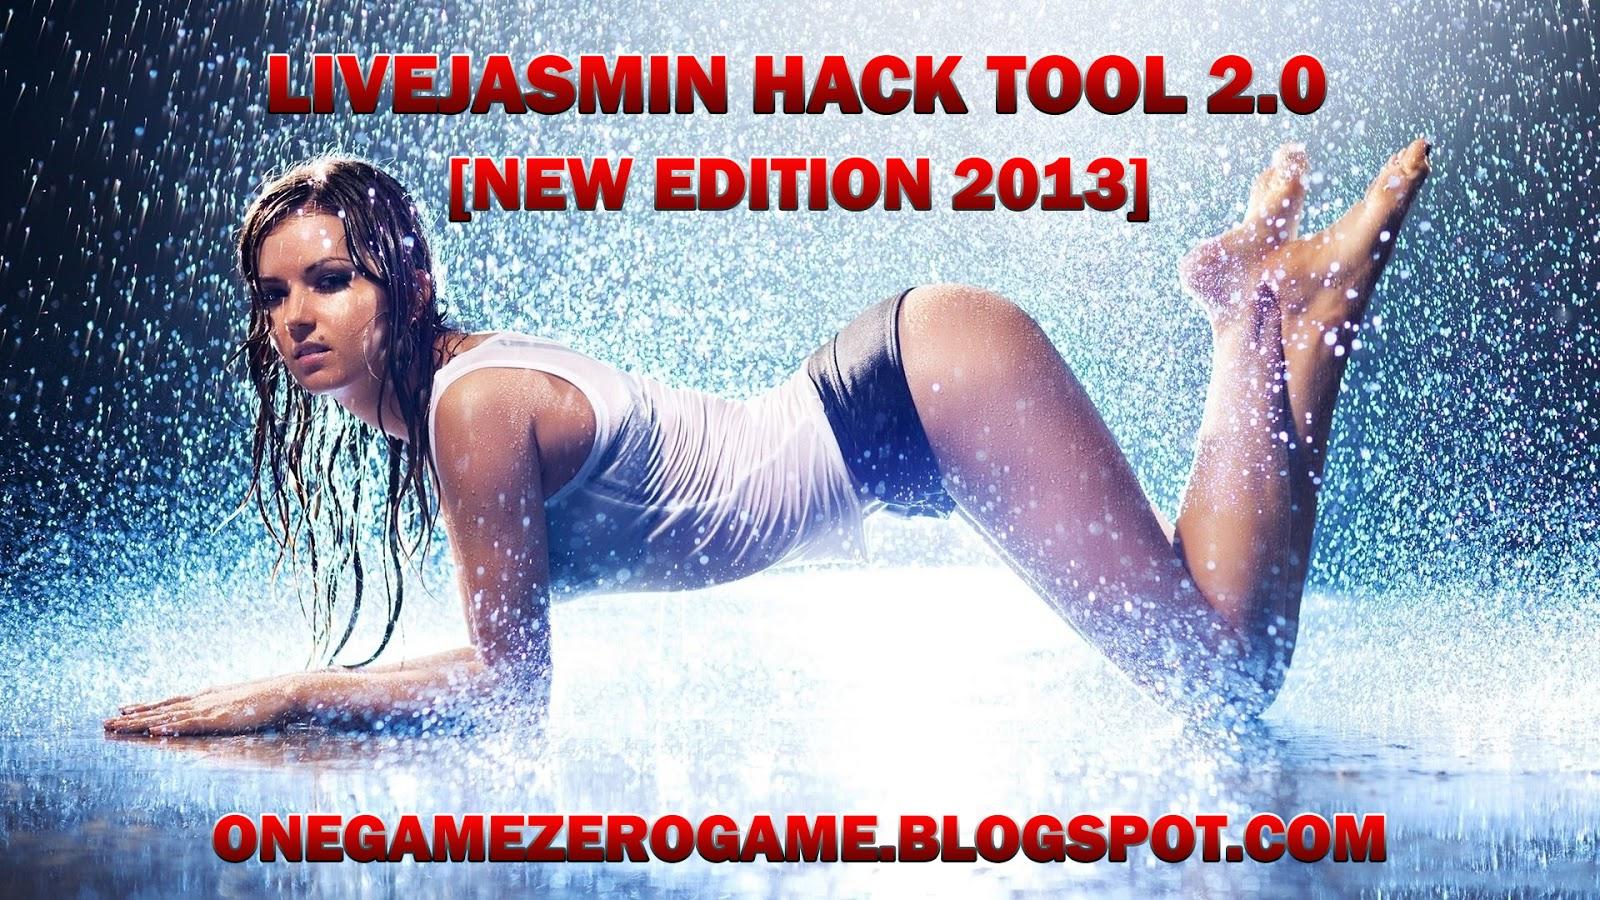 Livejasmin free credits